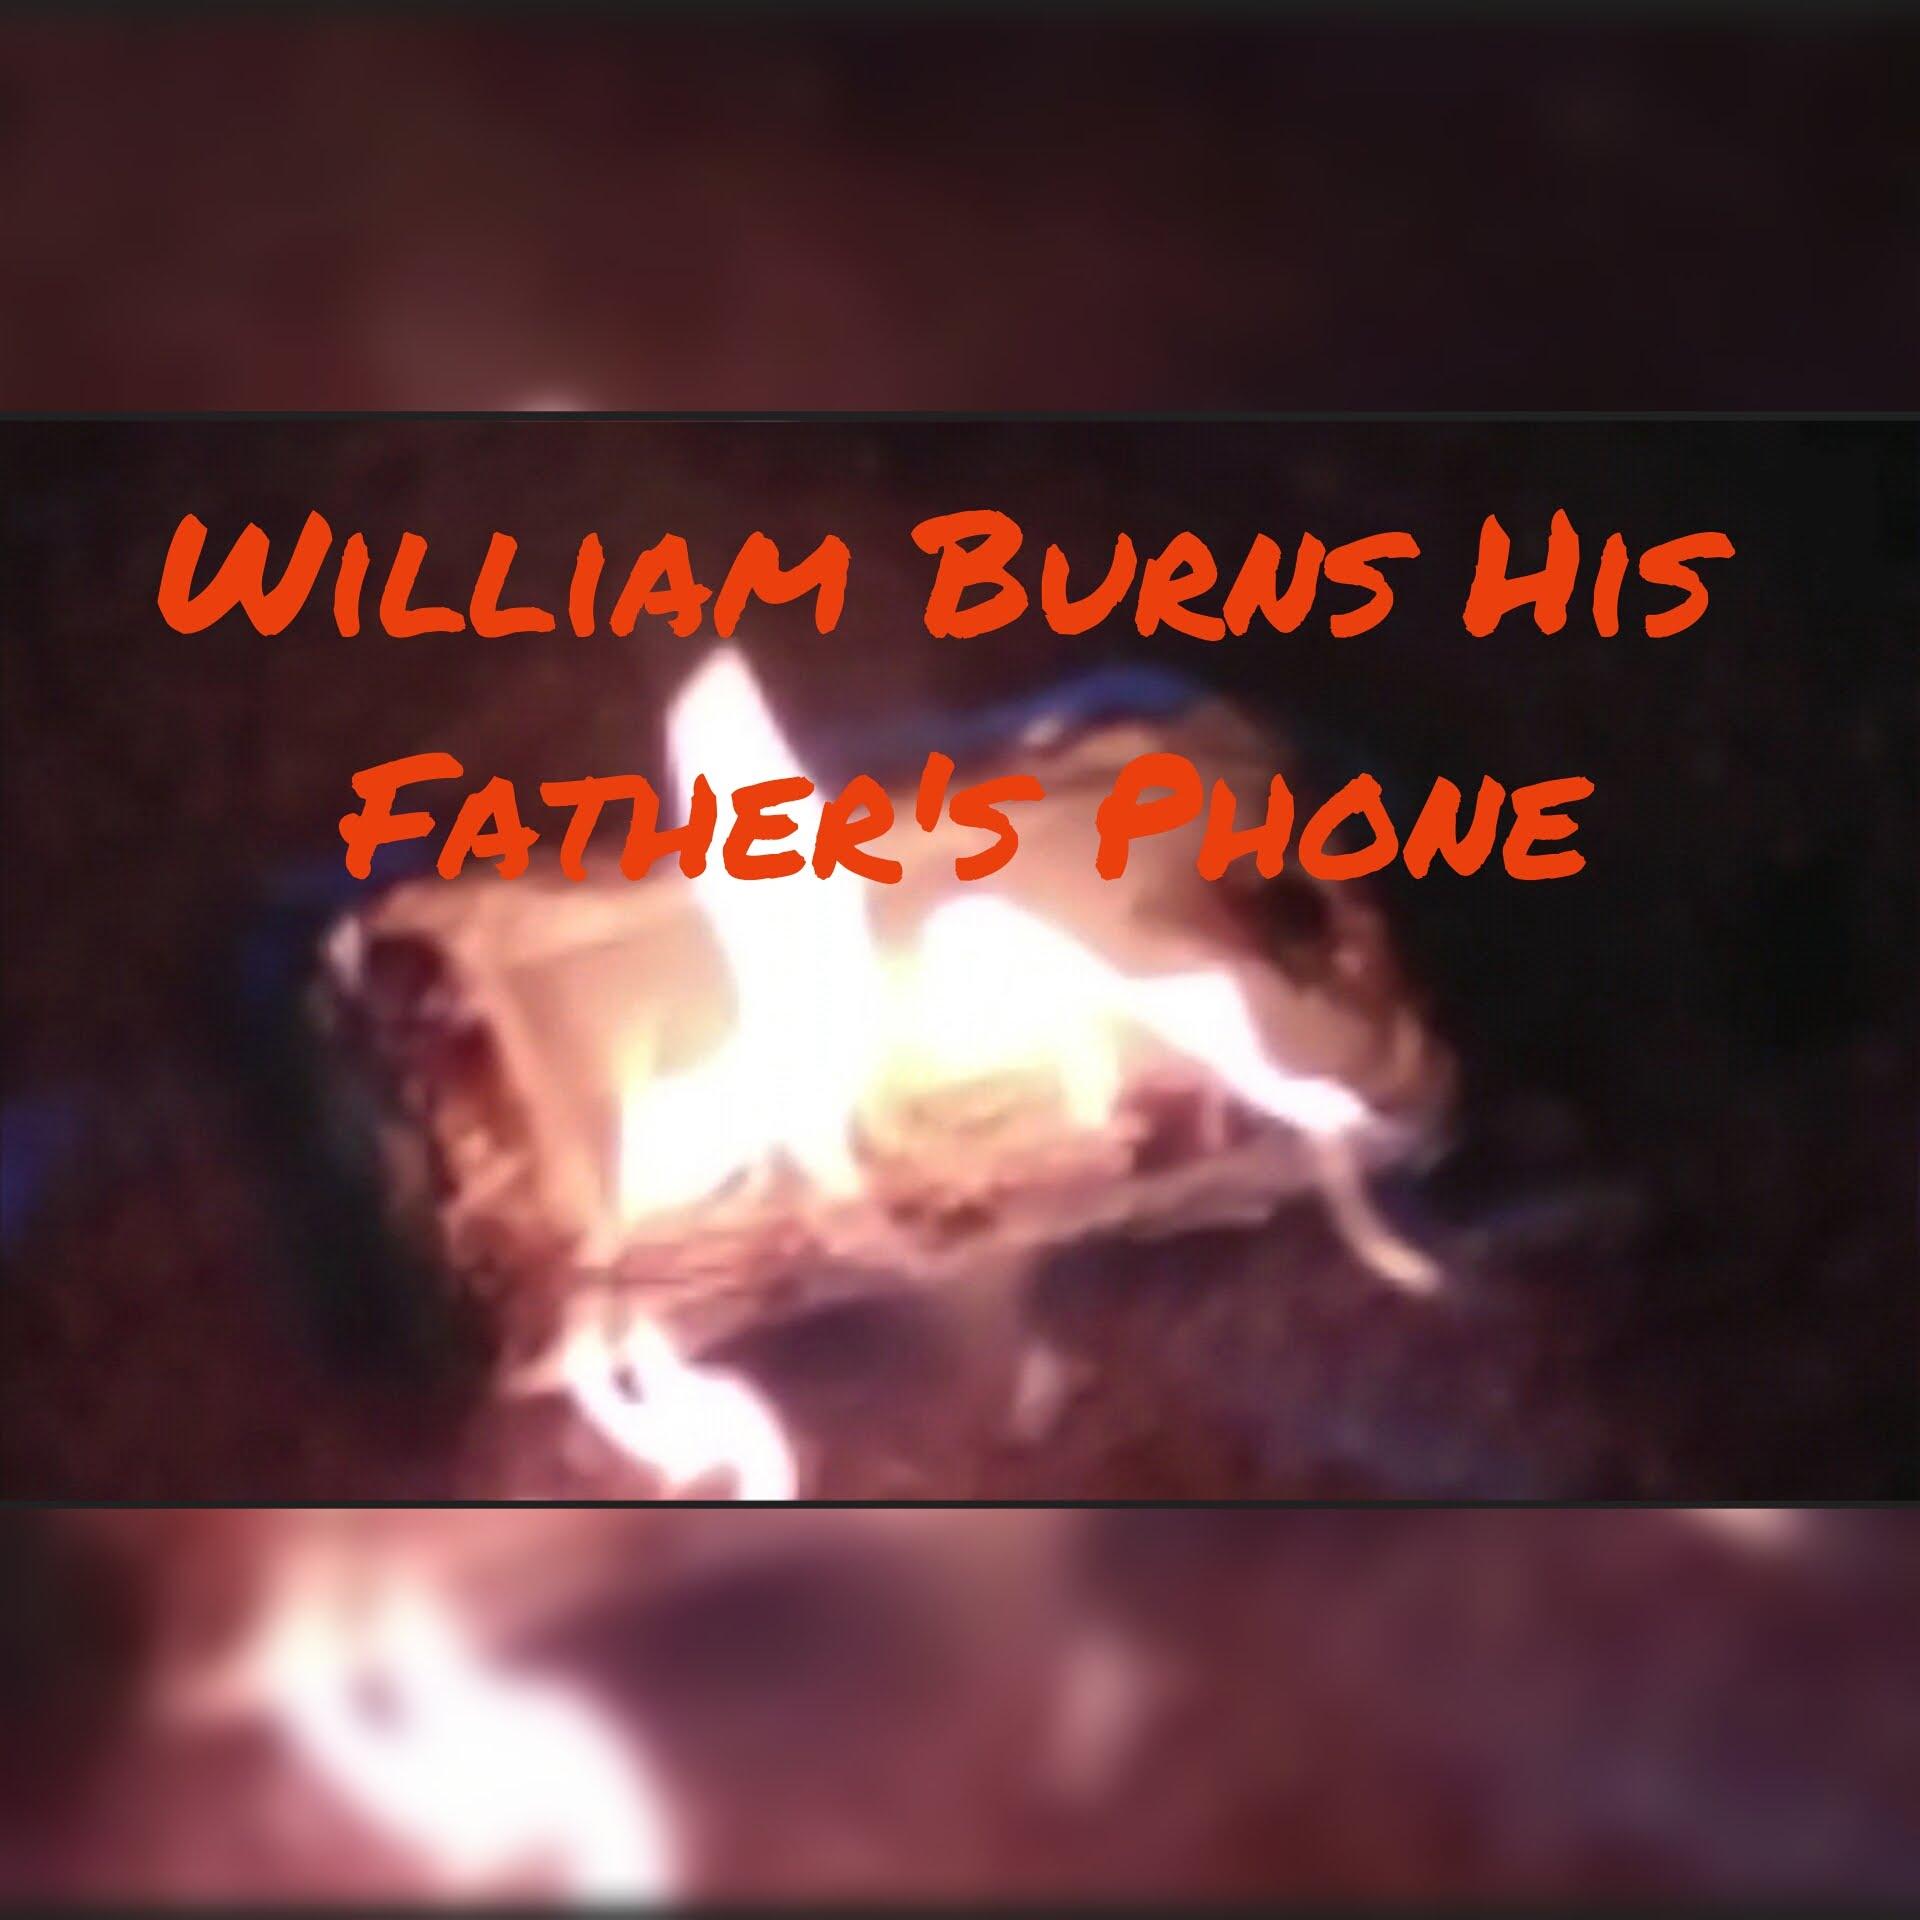 William burns his father's phone